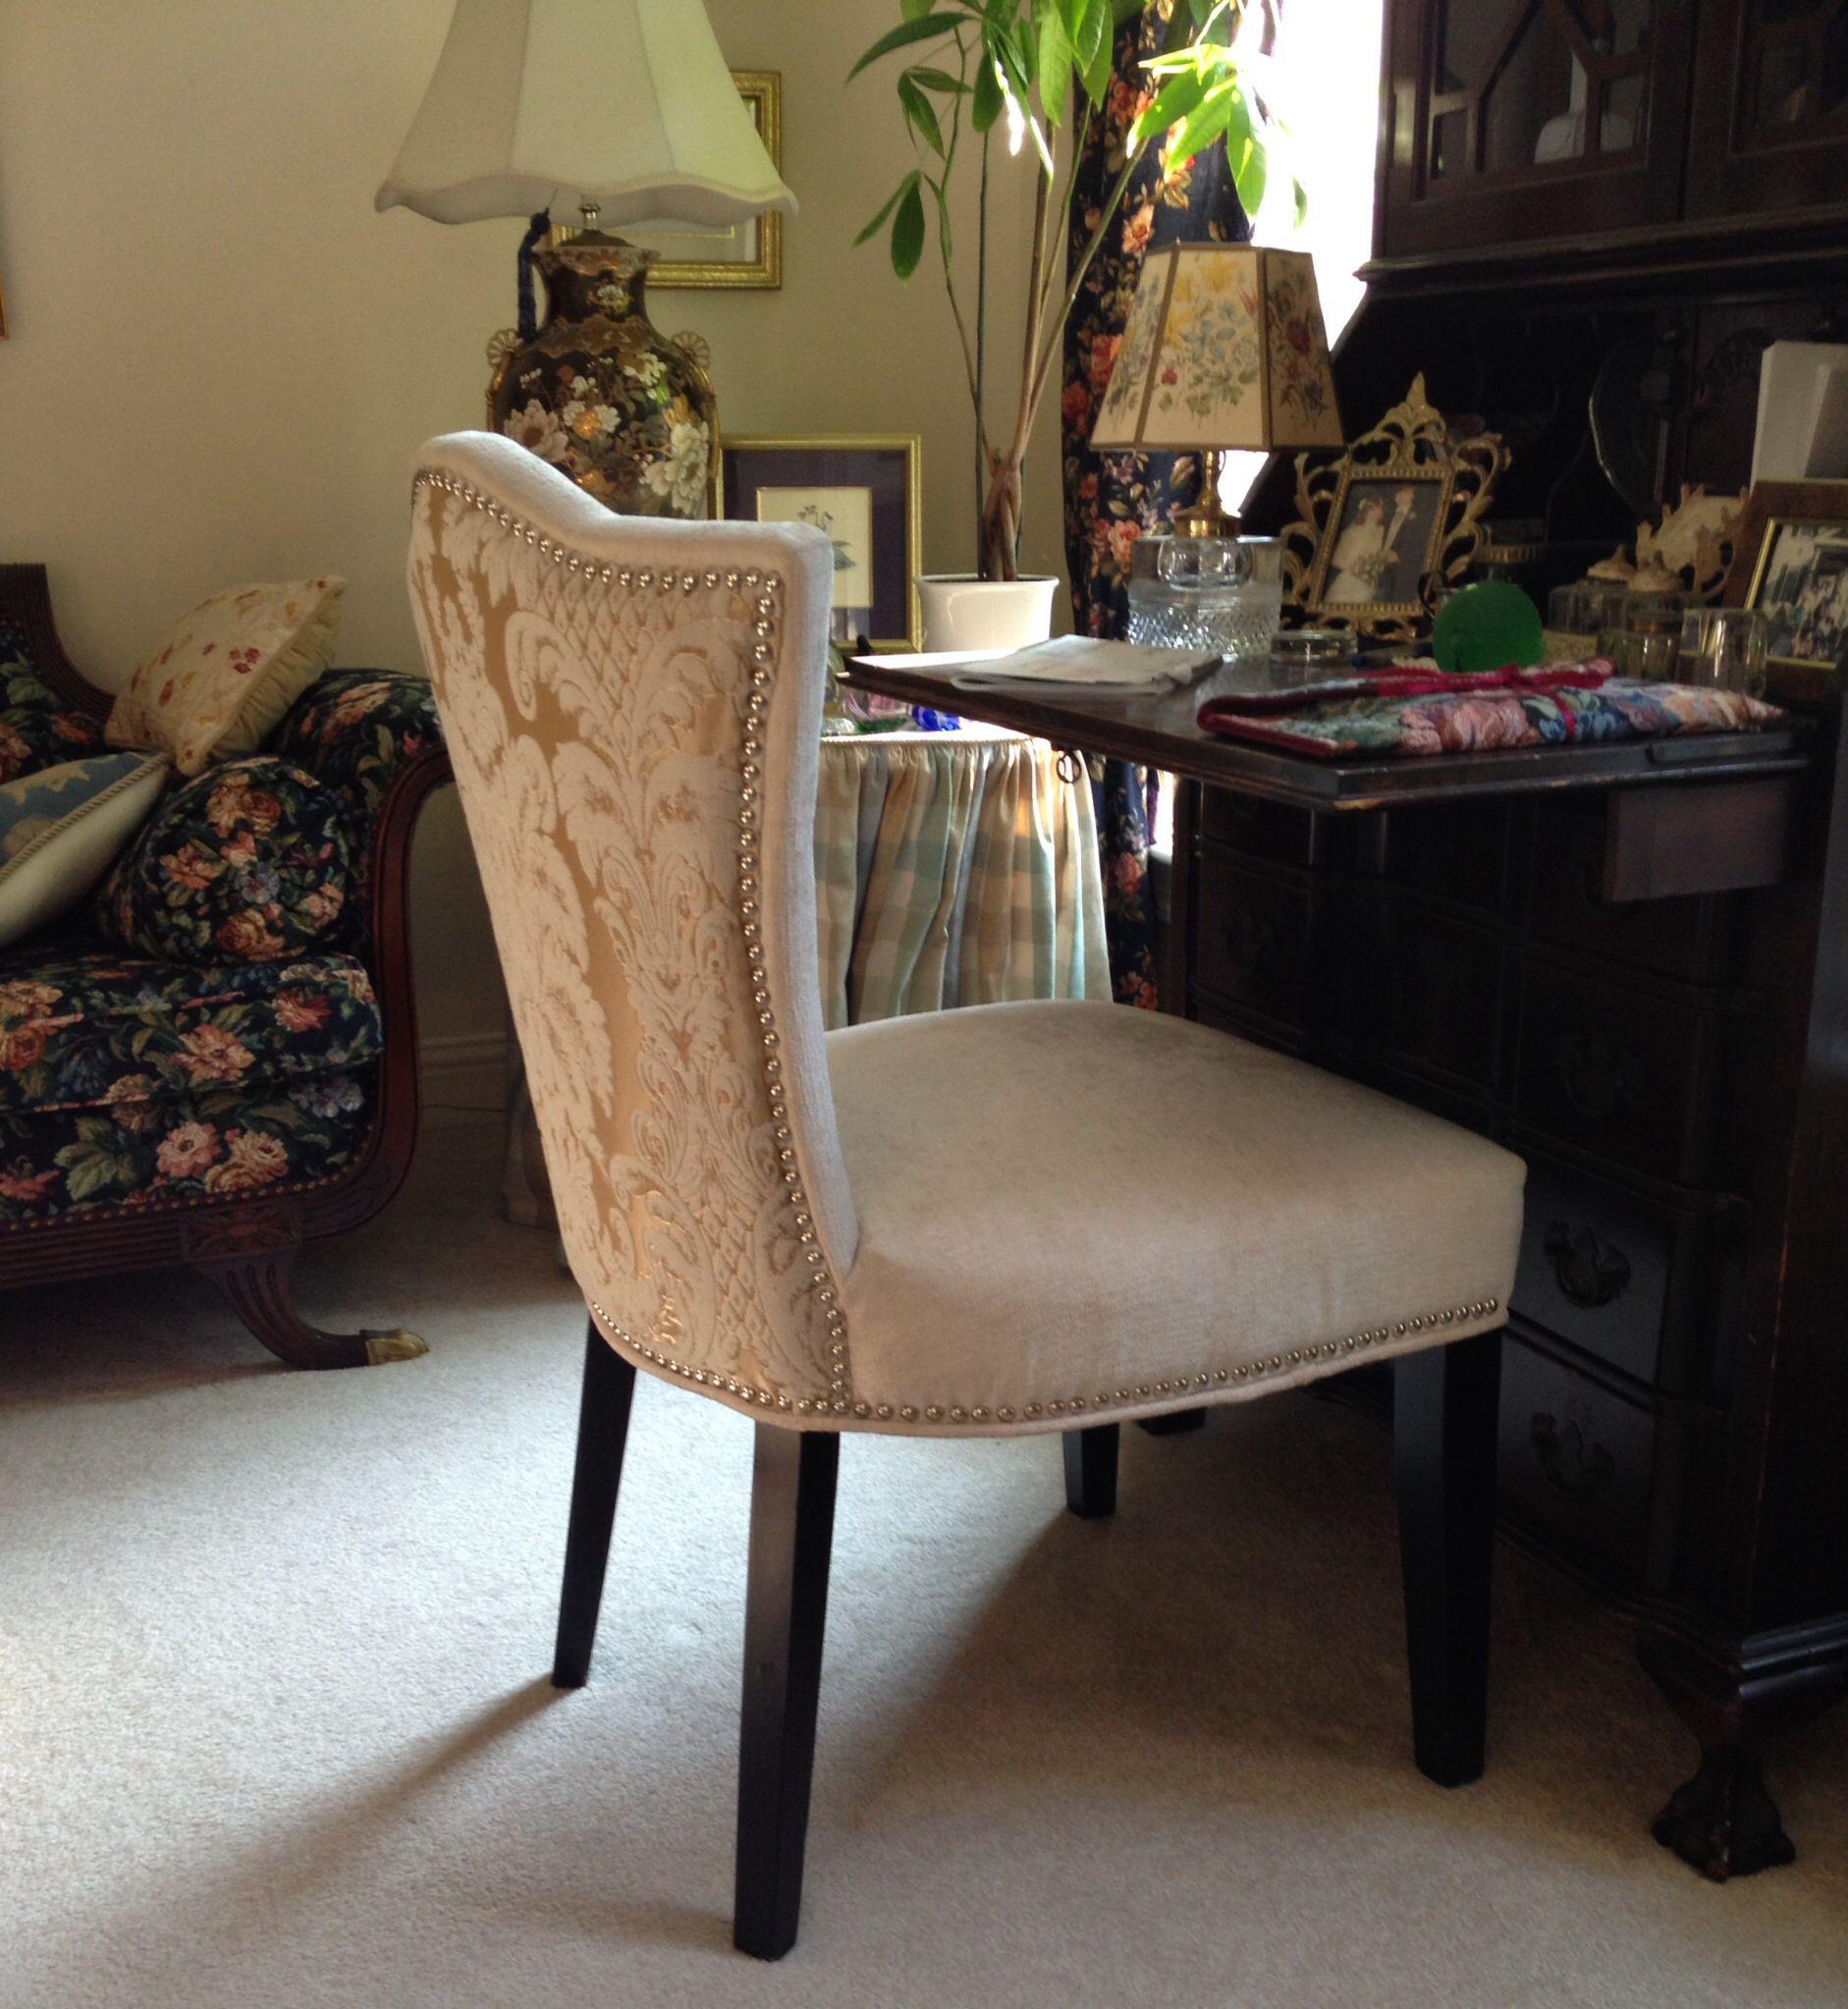 Jess's desk chair (TJMaxx find) Chair, Plastic chair